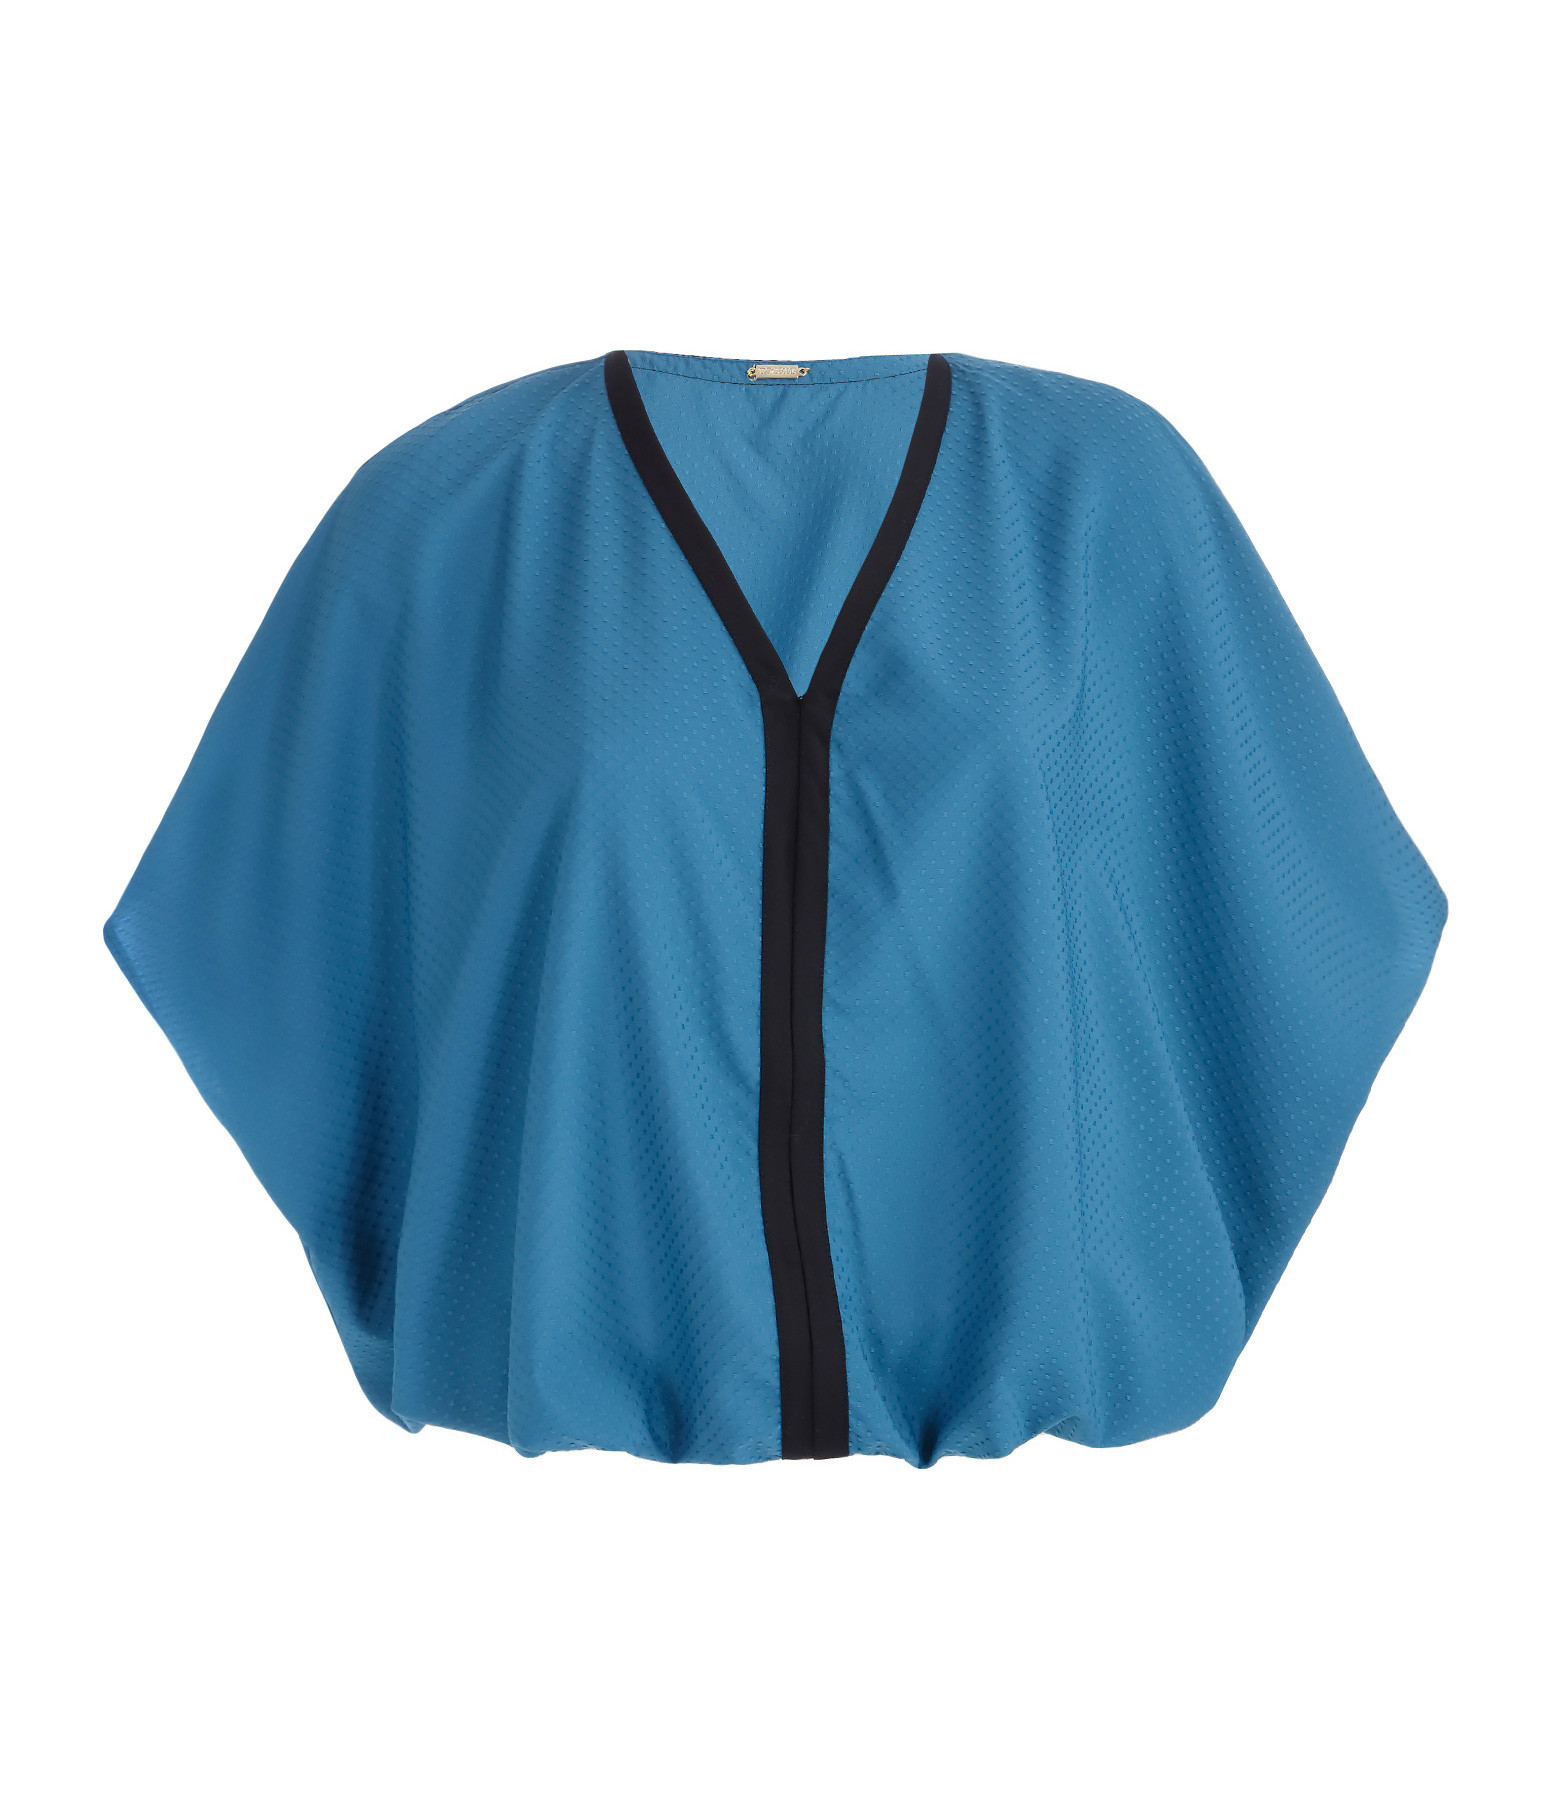 TOOSHIE - Top Anacapri Bluette Noir